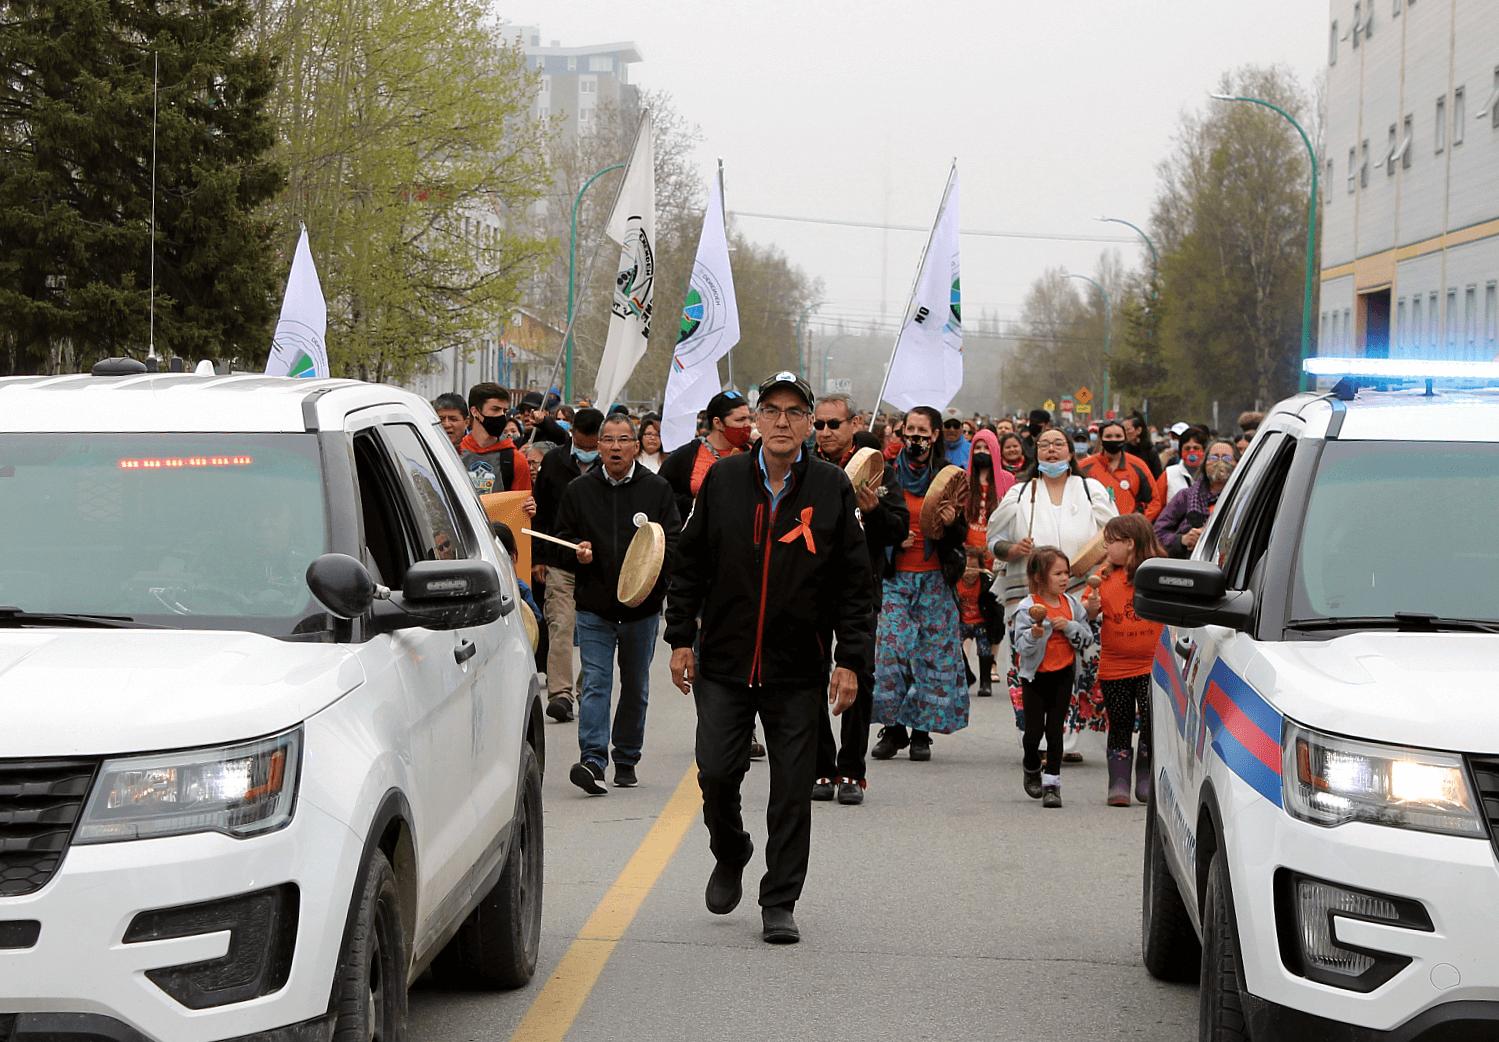 IN PHOTOS: Large crowd attends memorial walk for Kamloops 215